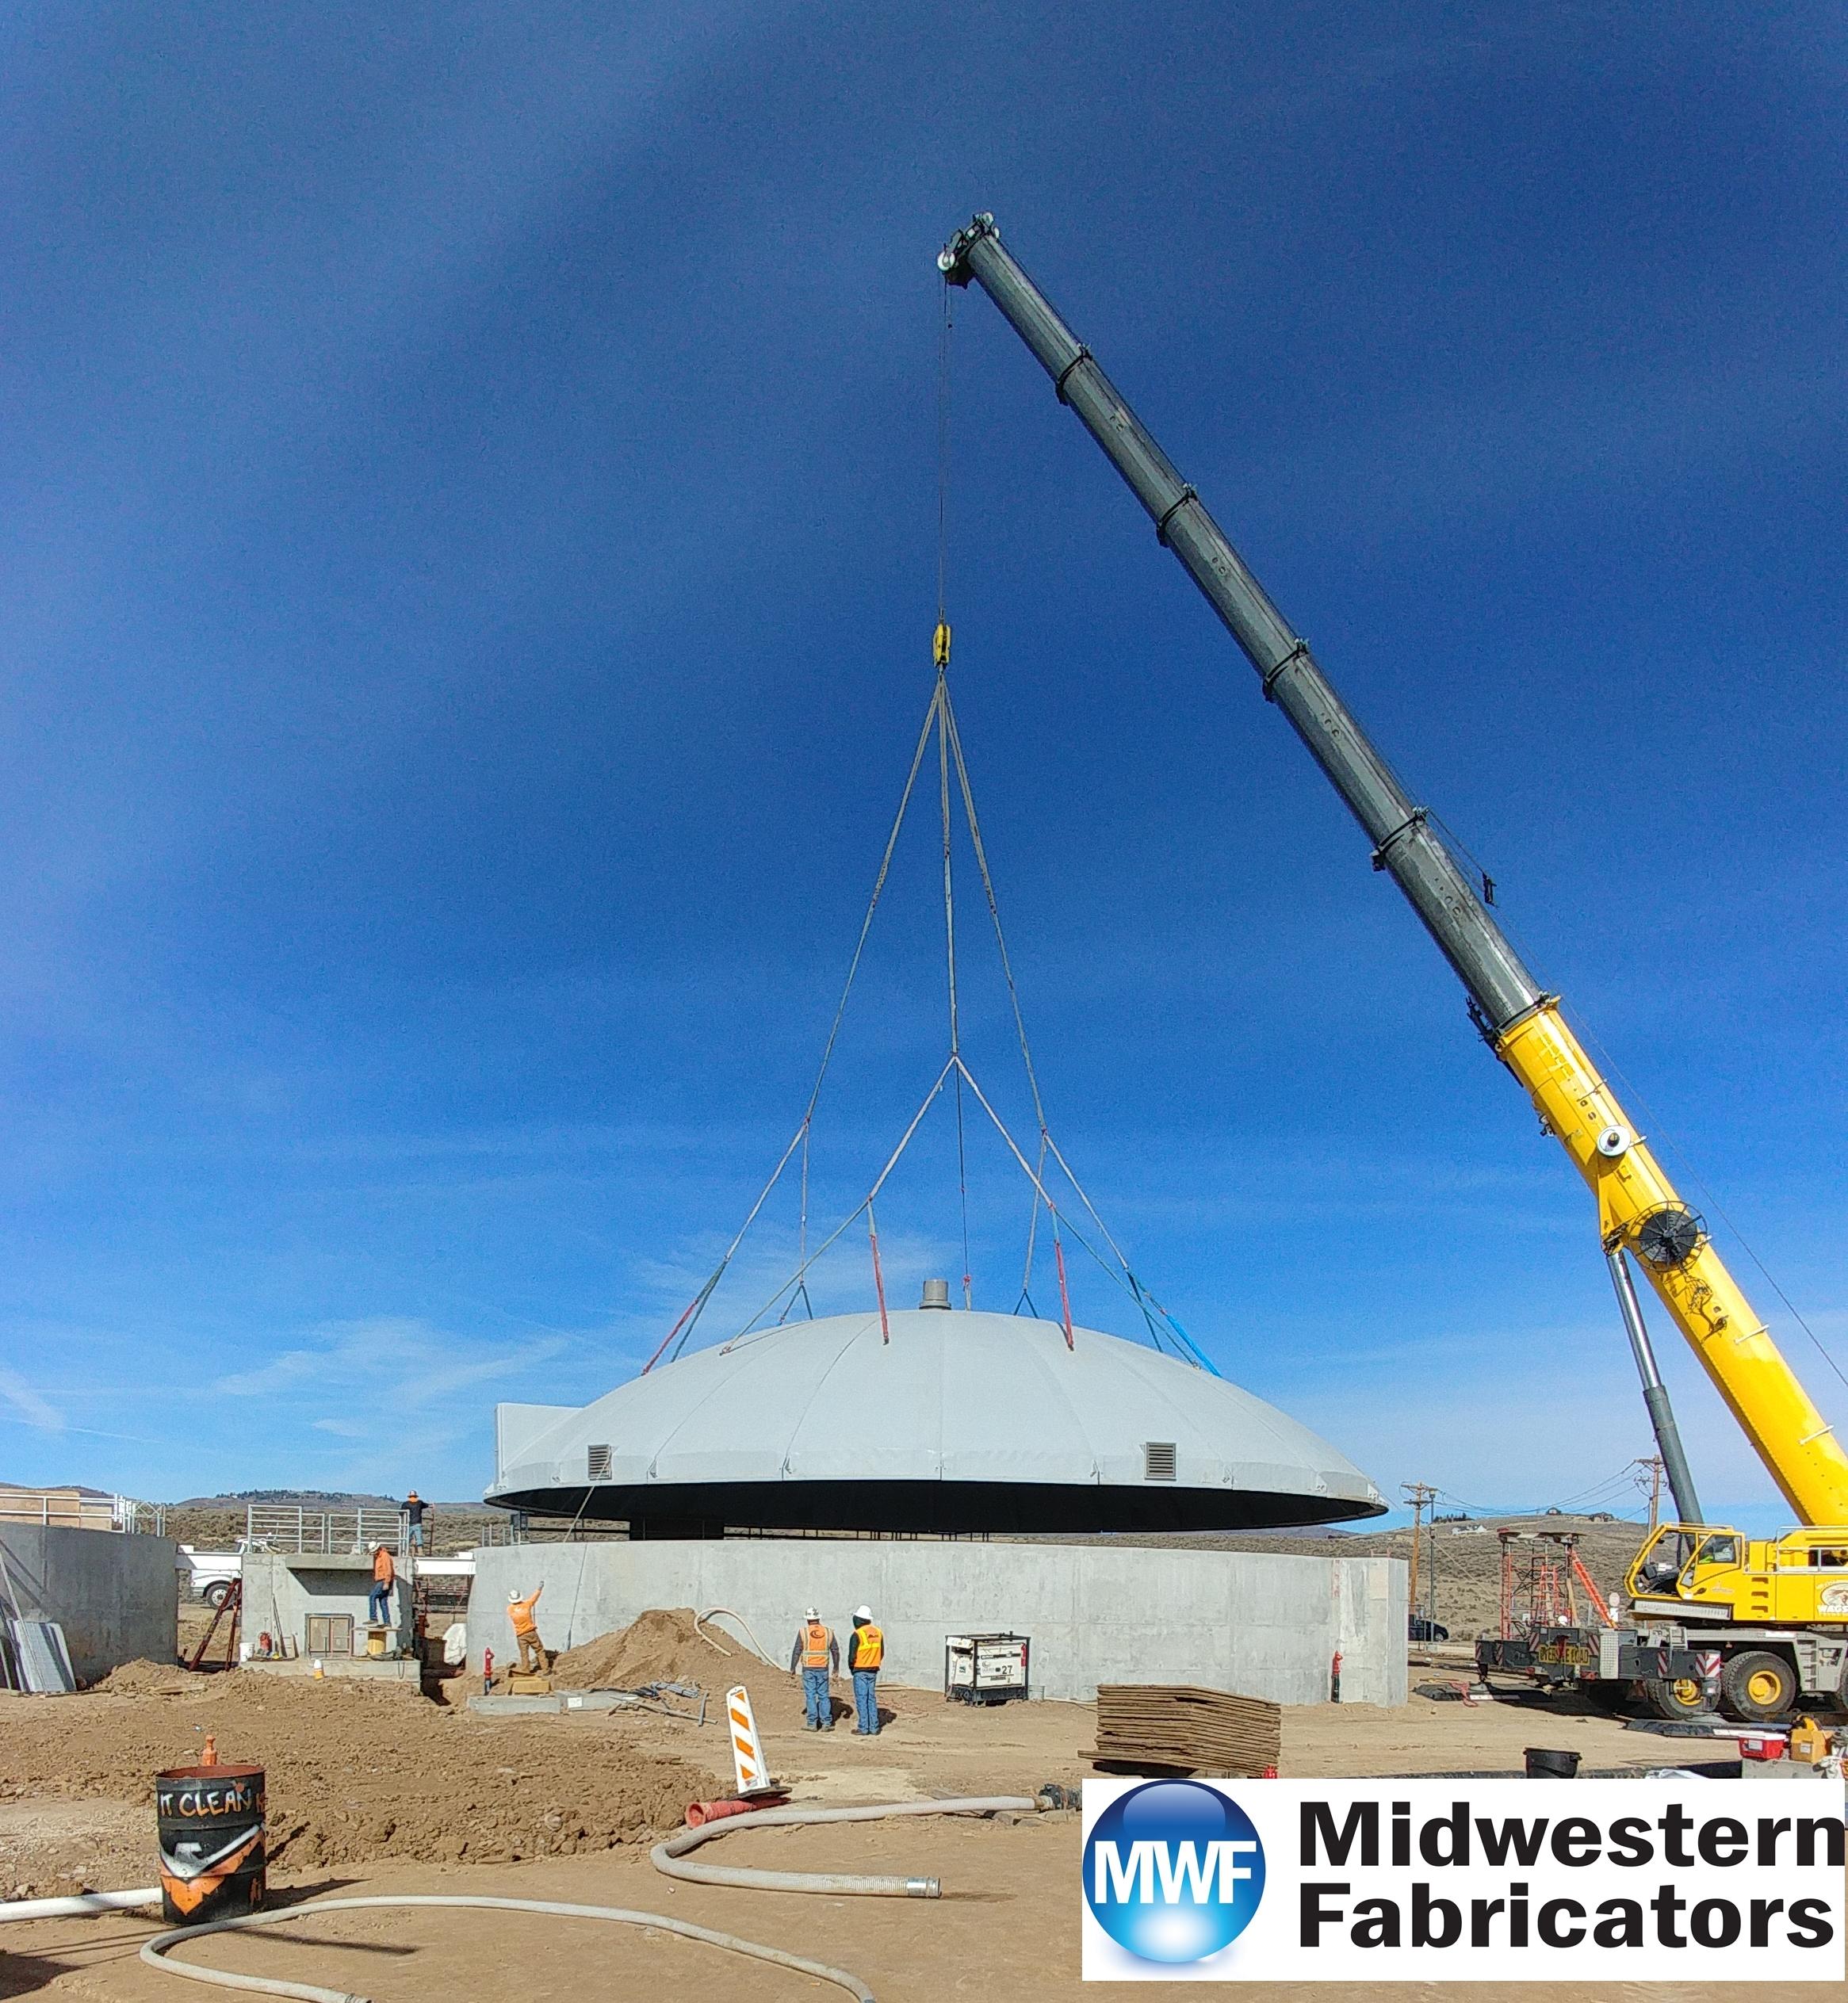 midwestern fabricators fiberglass dome cover